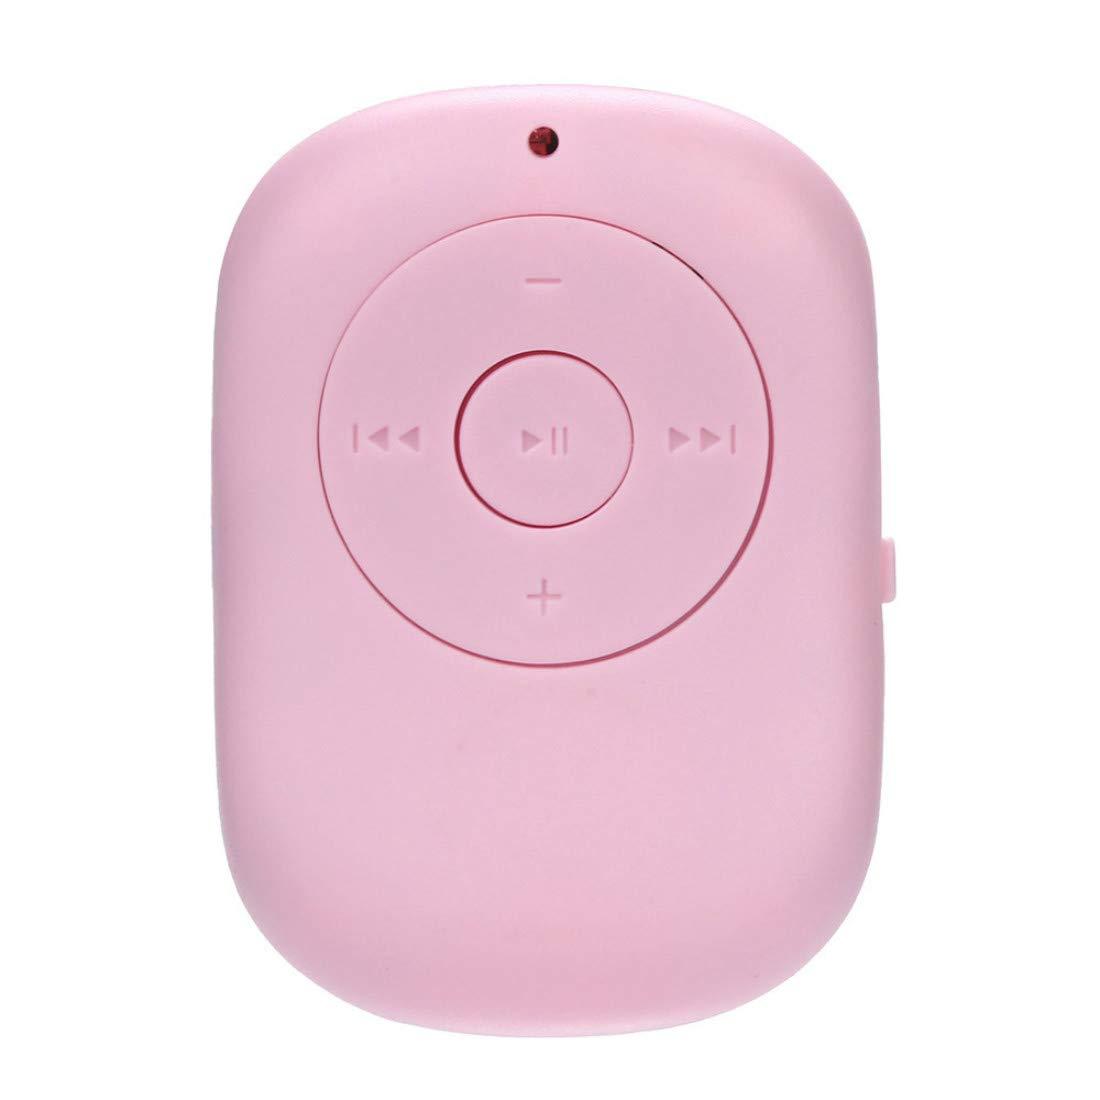 PCEPEIVK Portable Mini USB MP3 Player Support Micro SD TF Card 32GB Sport Music Media Walkman